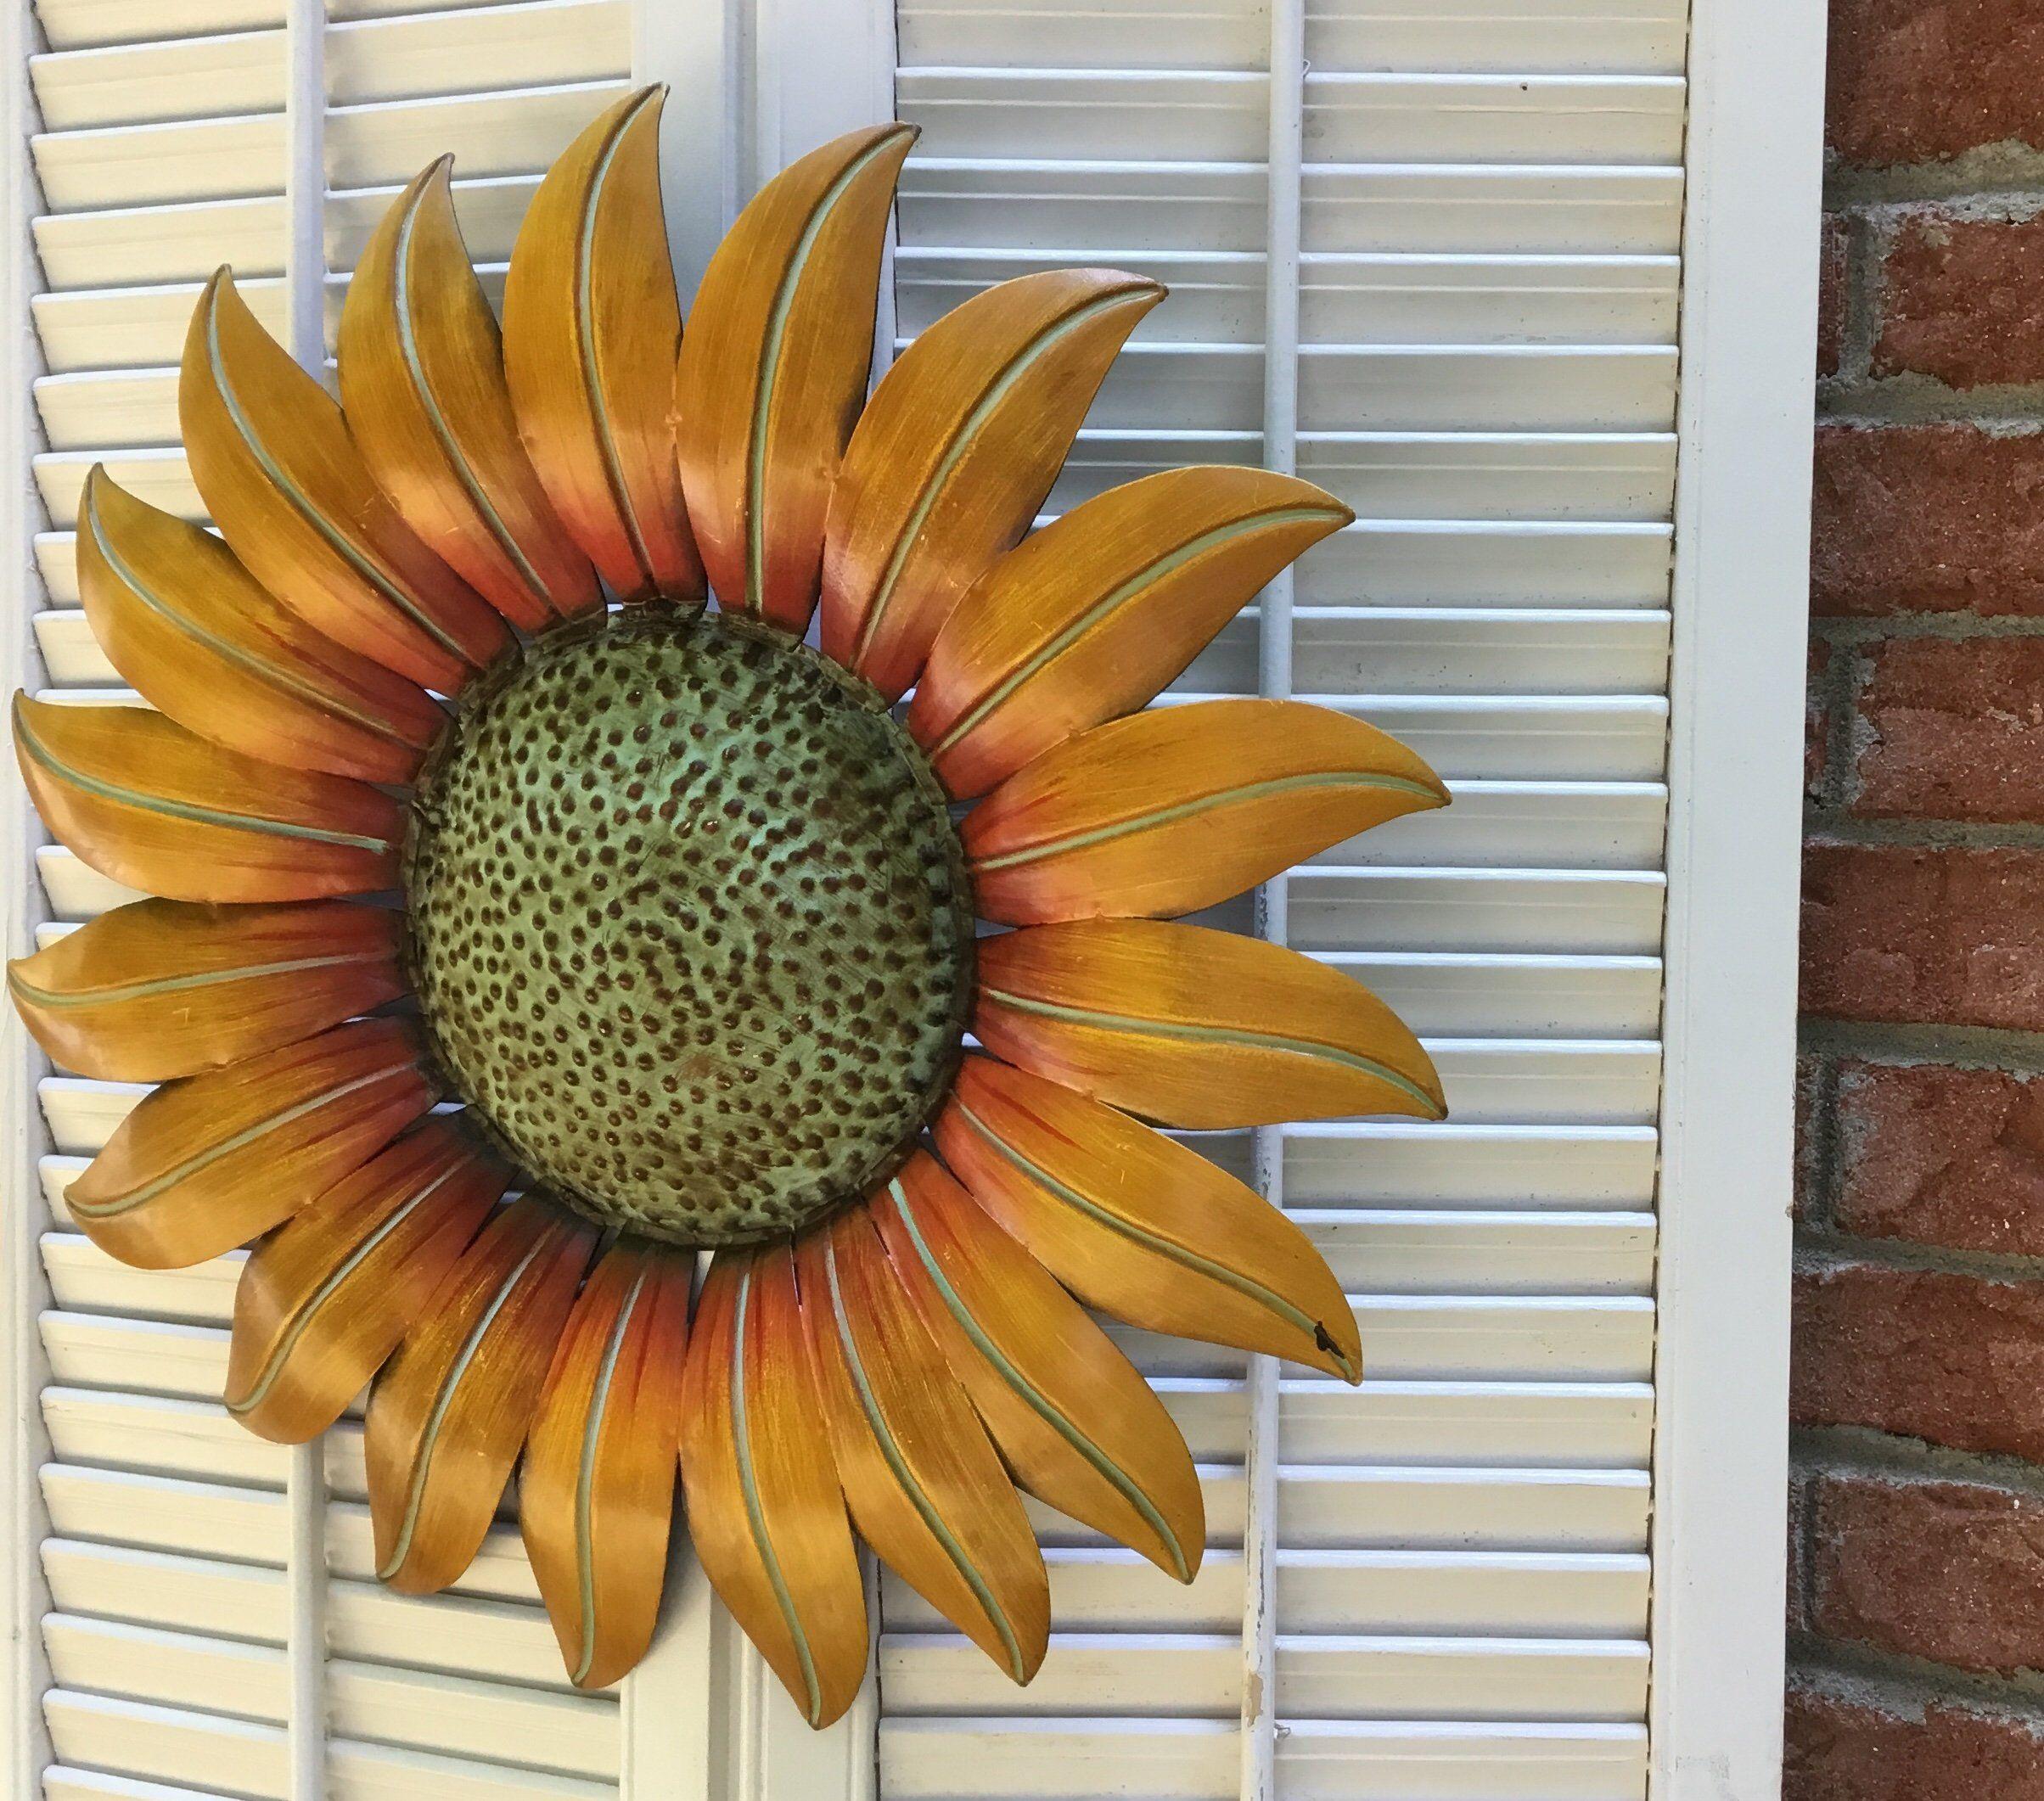 Fall Home Decor Garden Decor Autumn Gift Sunflower Decor Metal Sunflower Porch Decor Farmhou Sunflower Wall Decor Metal Wall Flowers Sunflower Decor